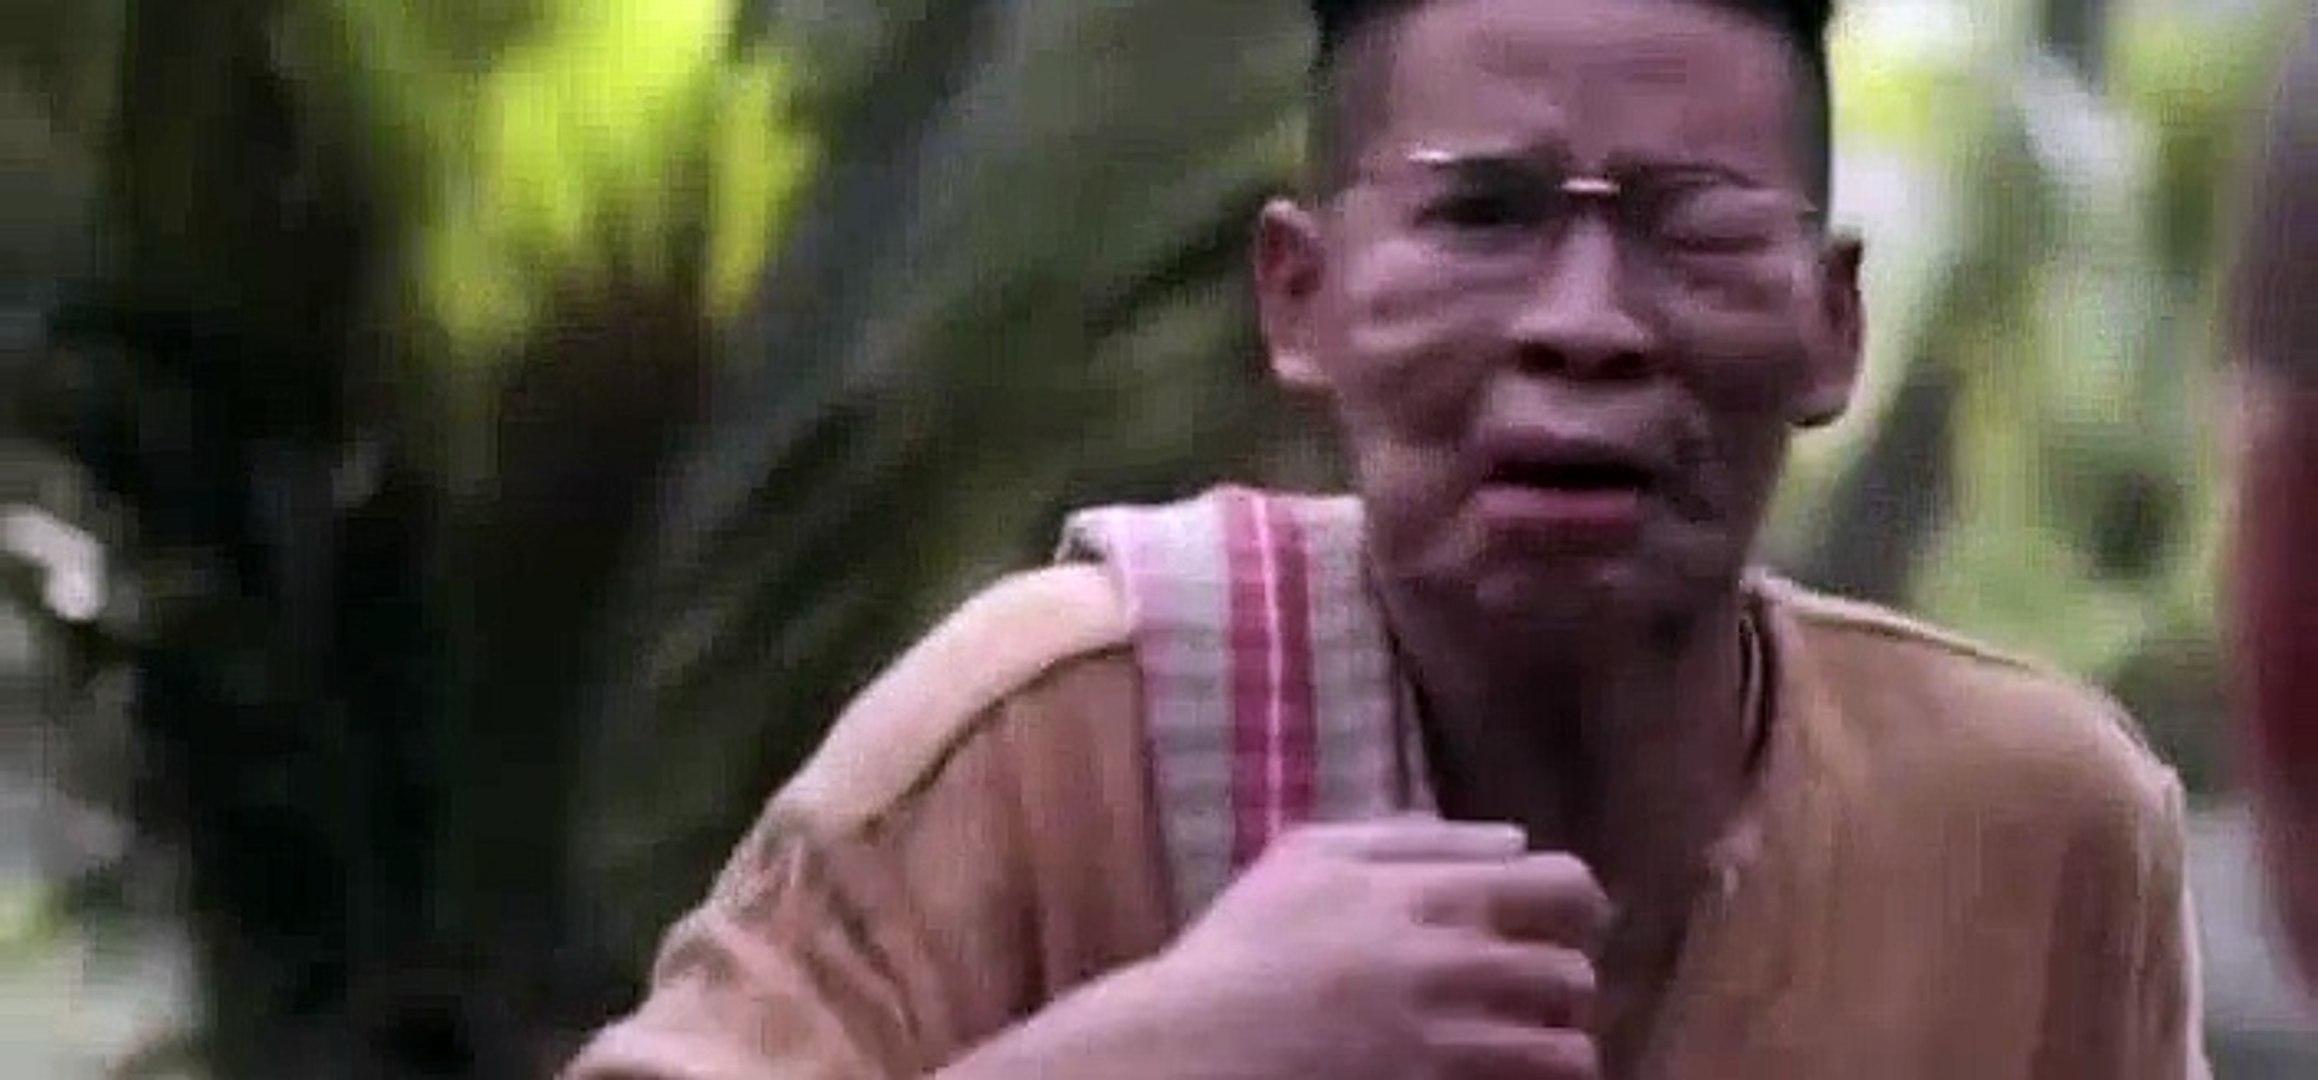 Pee Mak Phrakanong Official Trailer #1 (2013) - Banjong Pisanthanakun Movie HD [Full Episode]